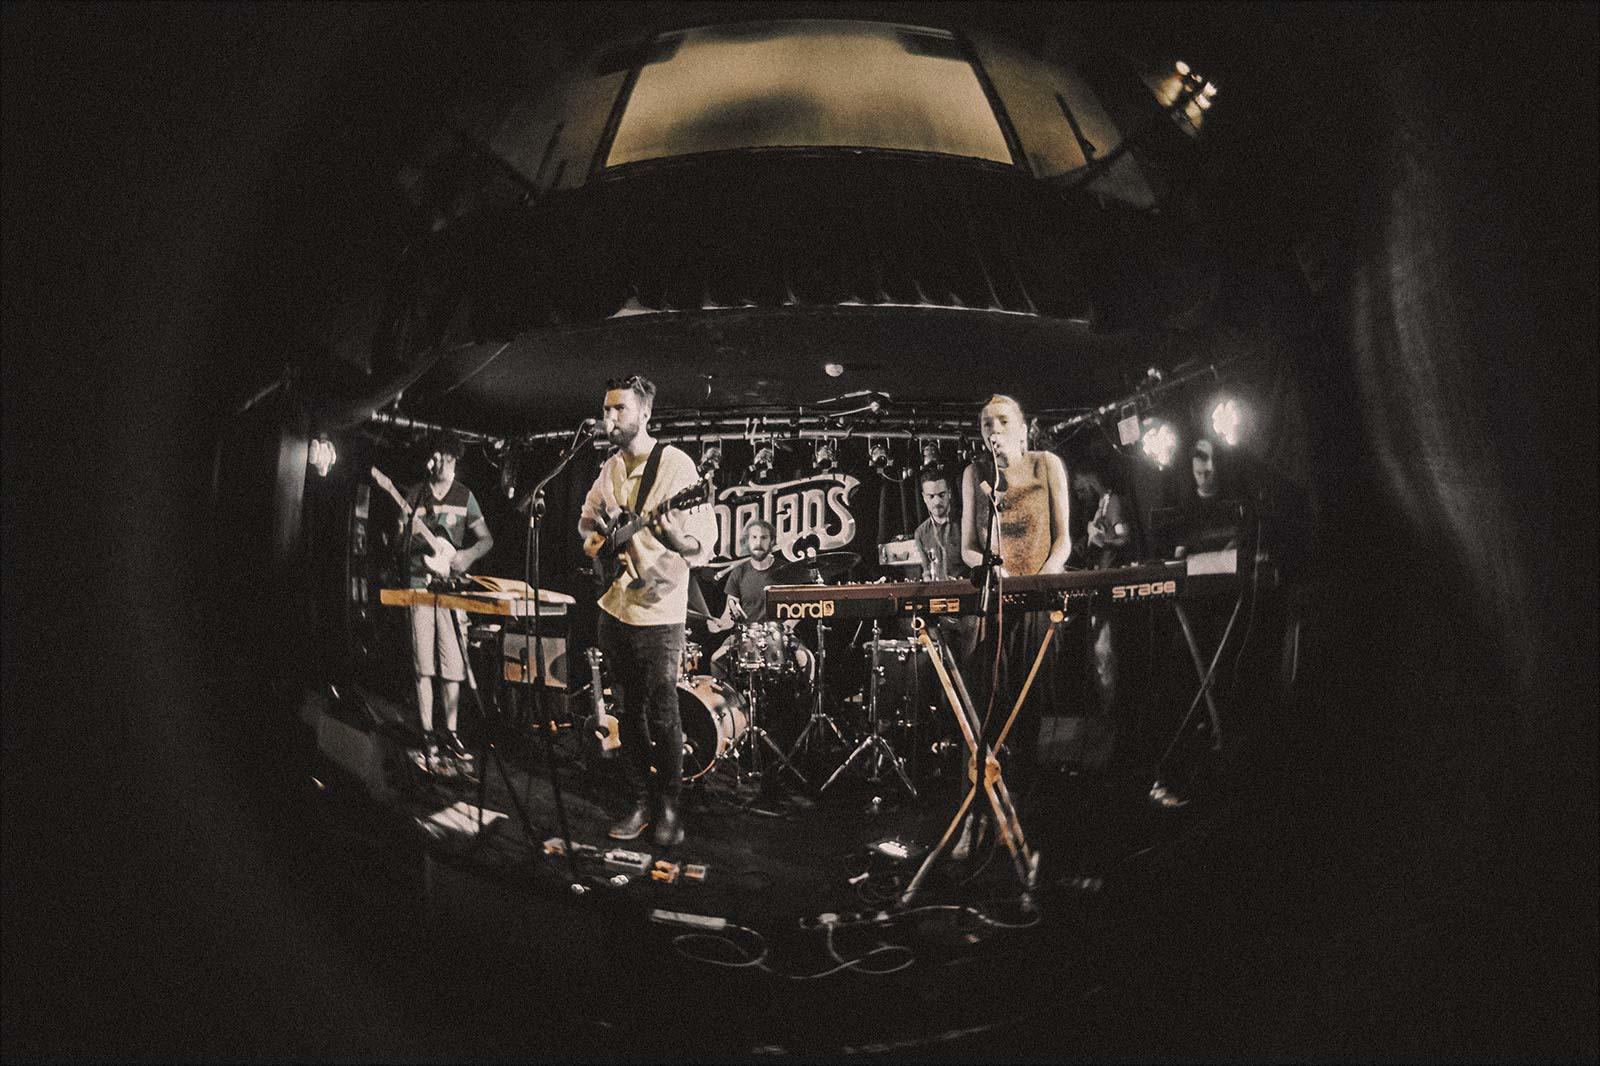 come_on_live_long_album_launch_whelans_dublin018.jpg